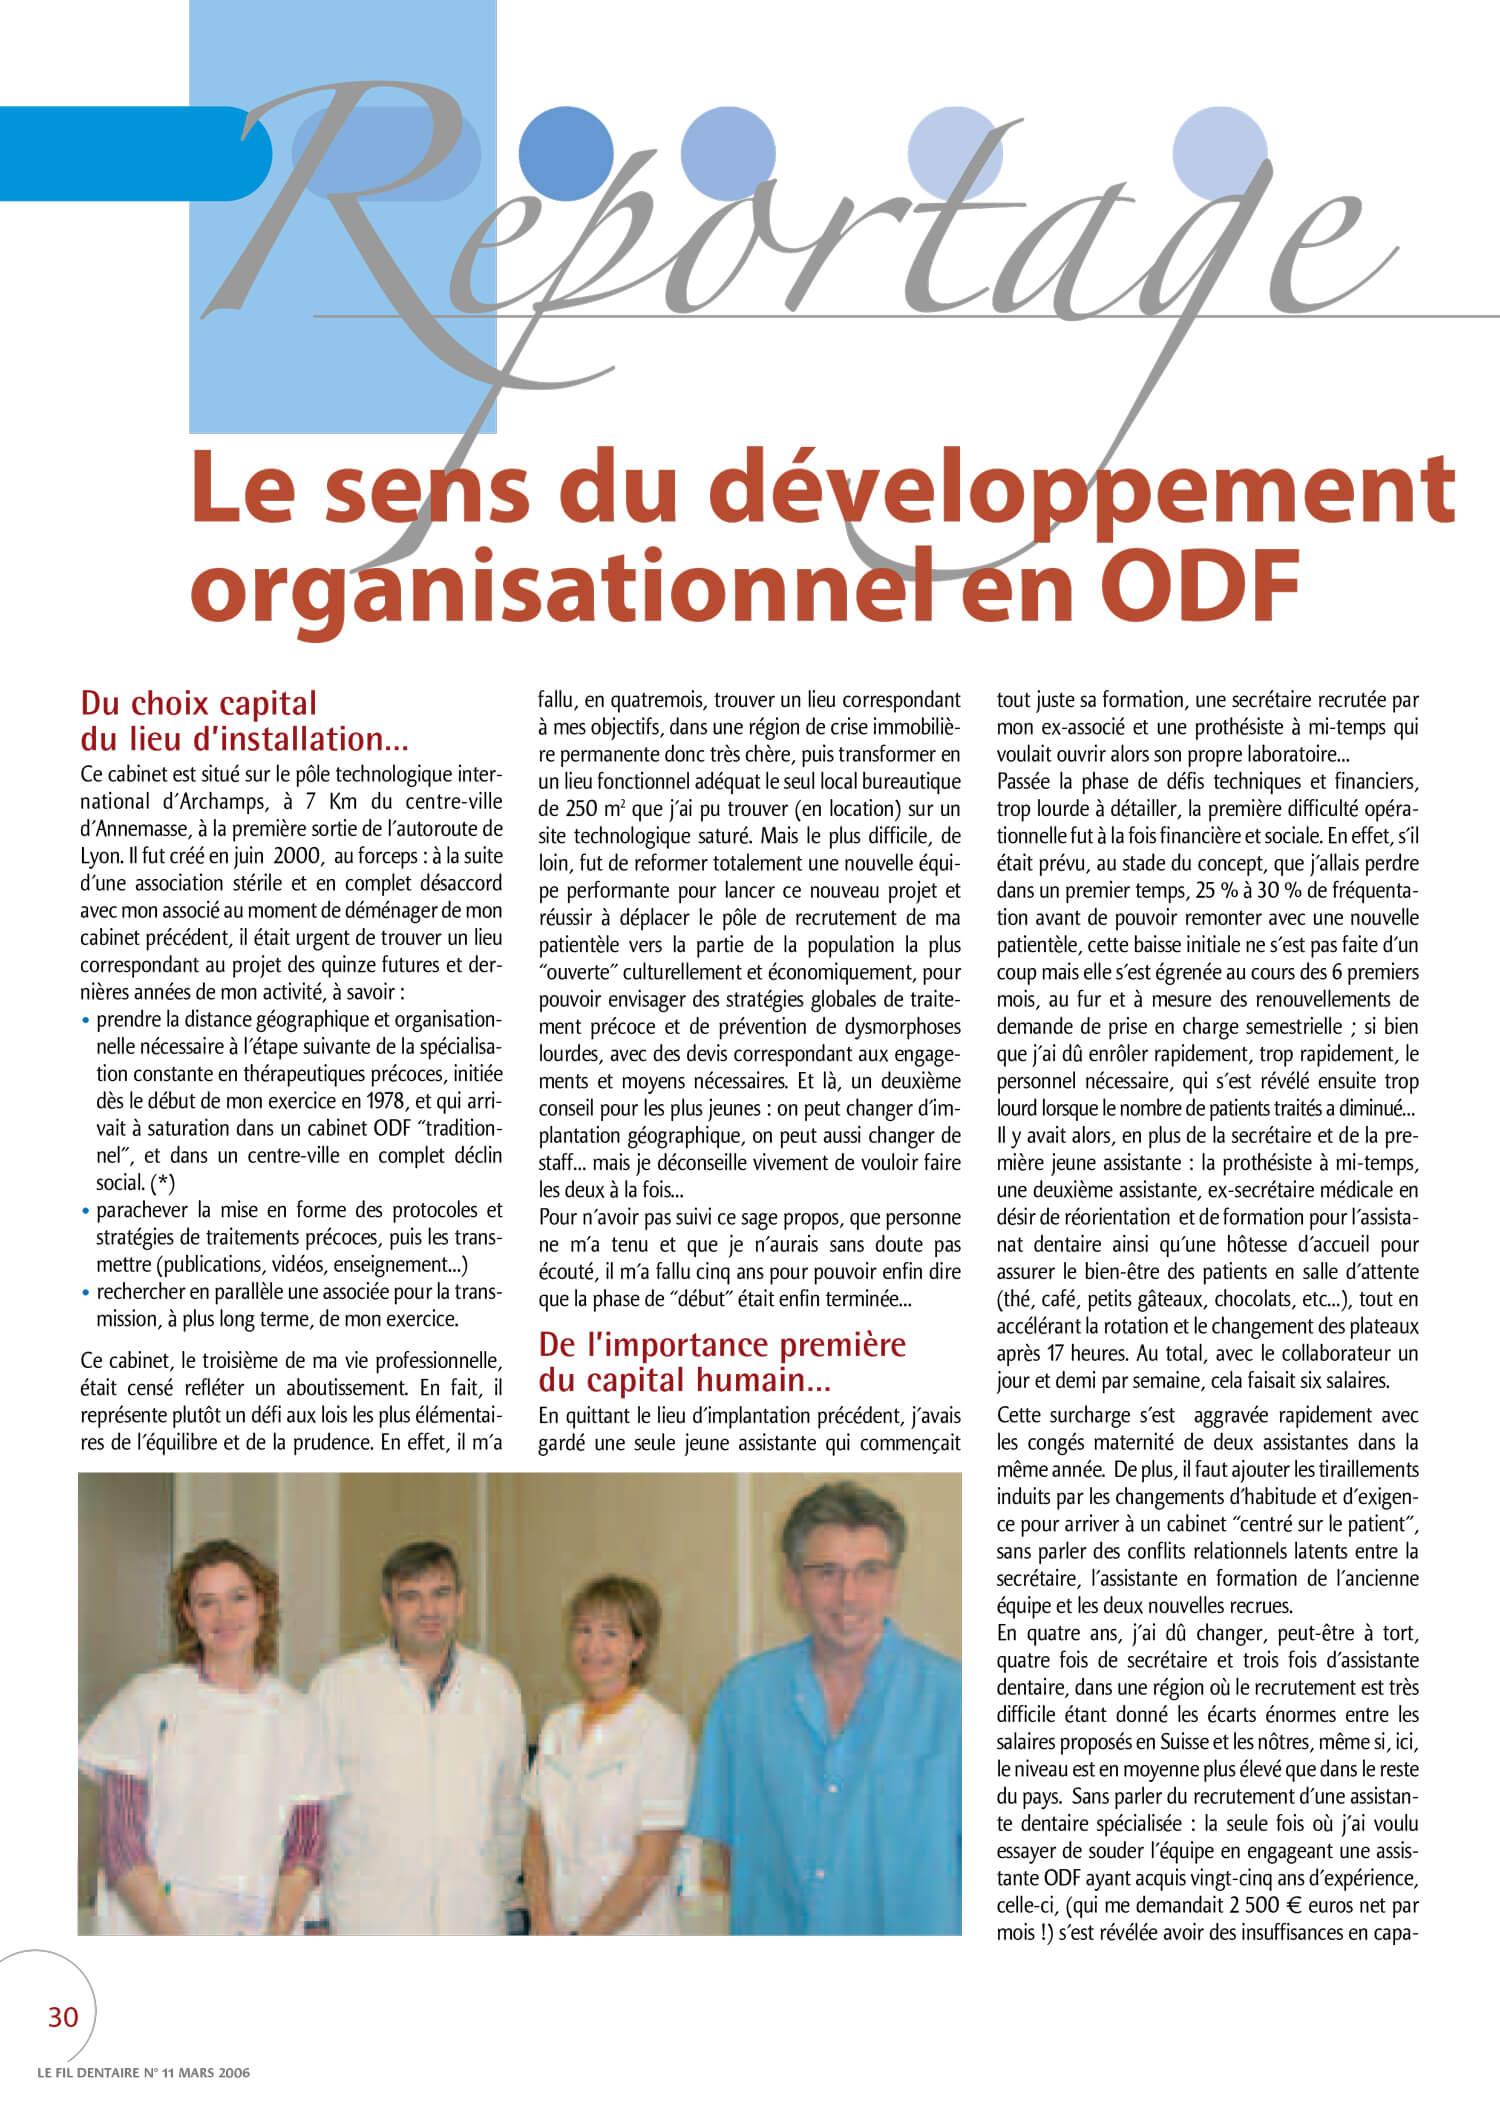 Le_Fil_Dentaire_Le_sens_du_developpement_managerial_en_ODF_Rodolphe_Cochet.jpg